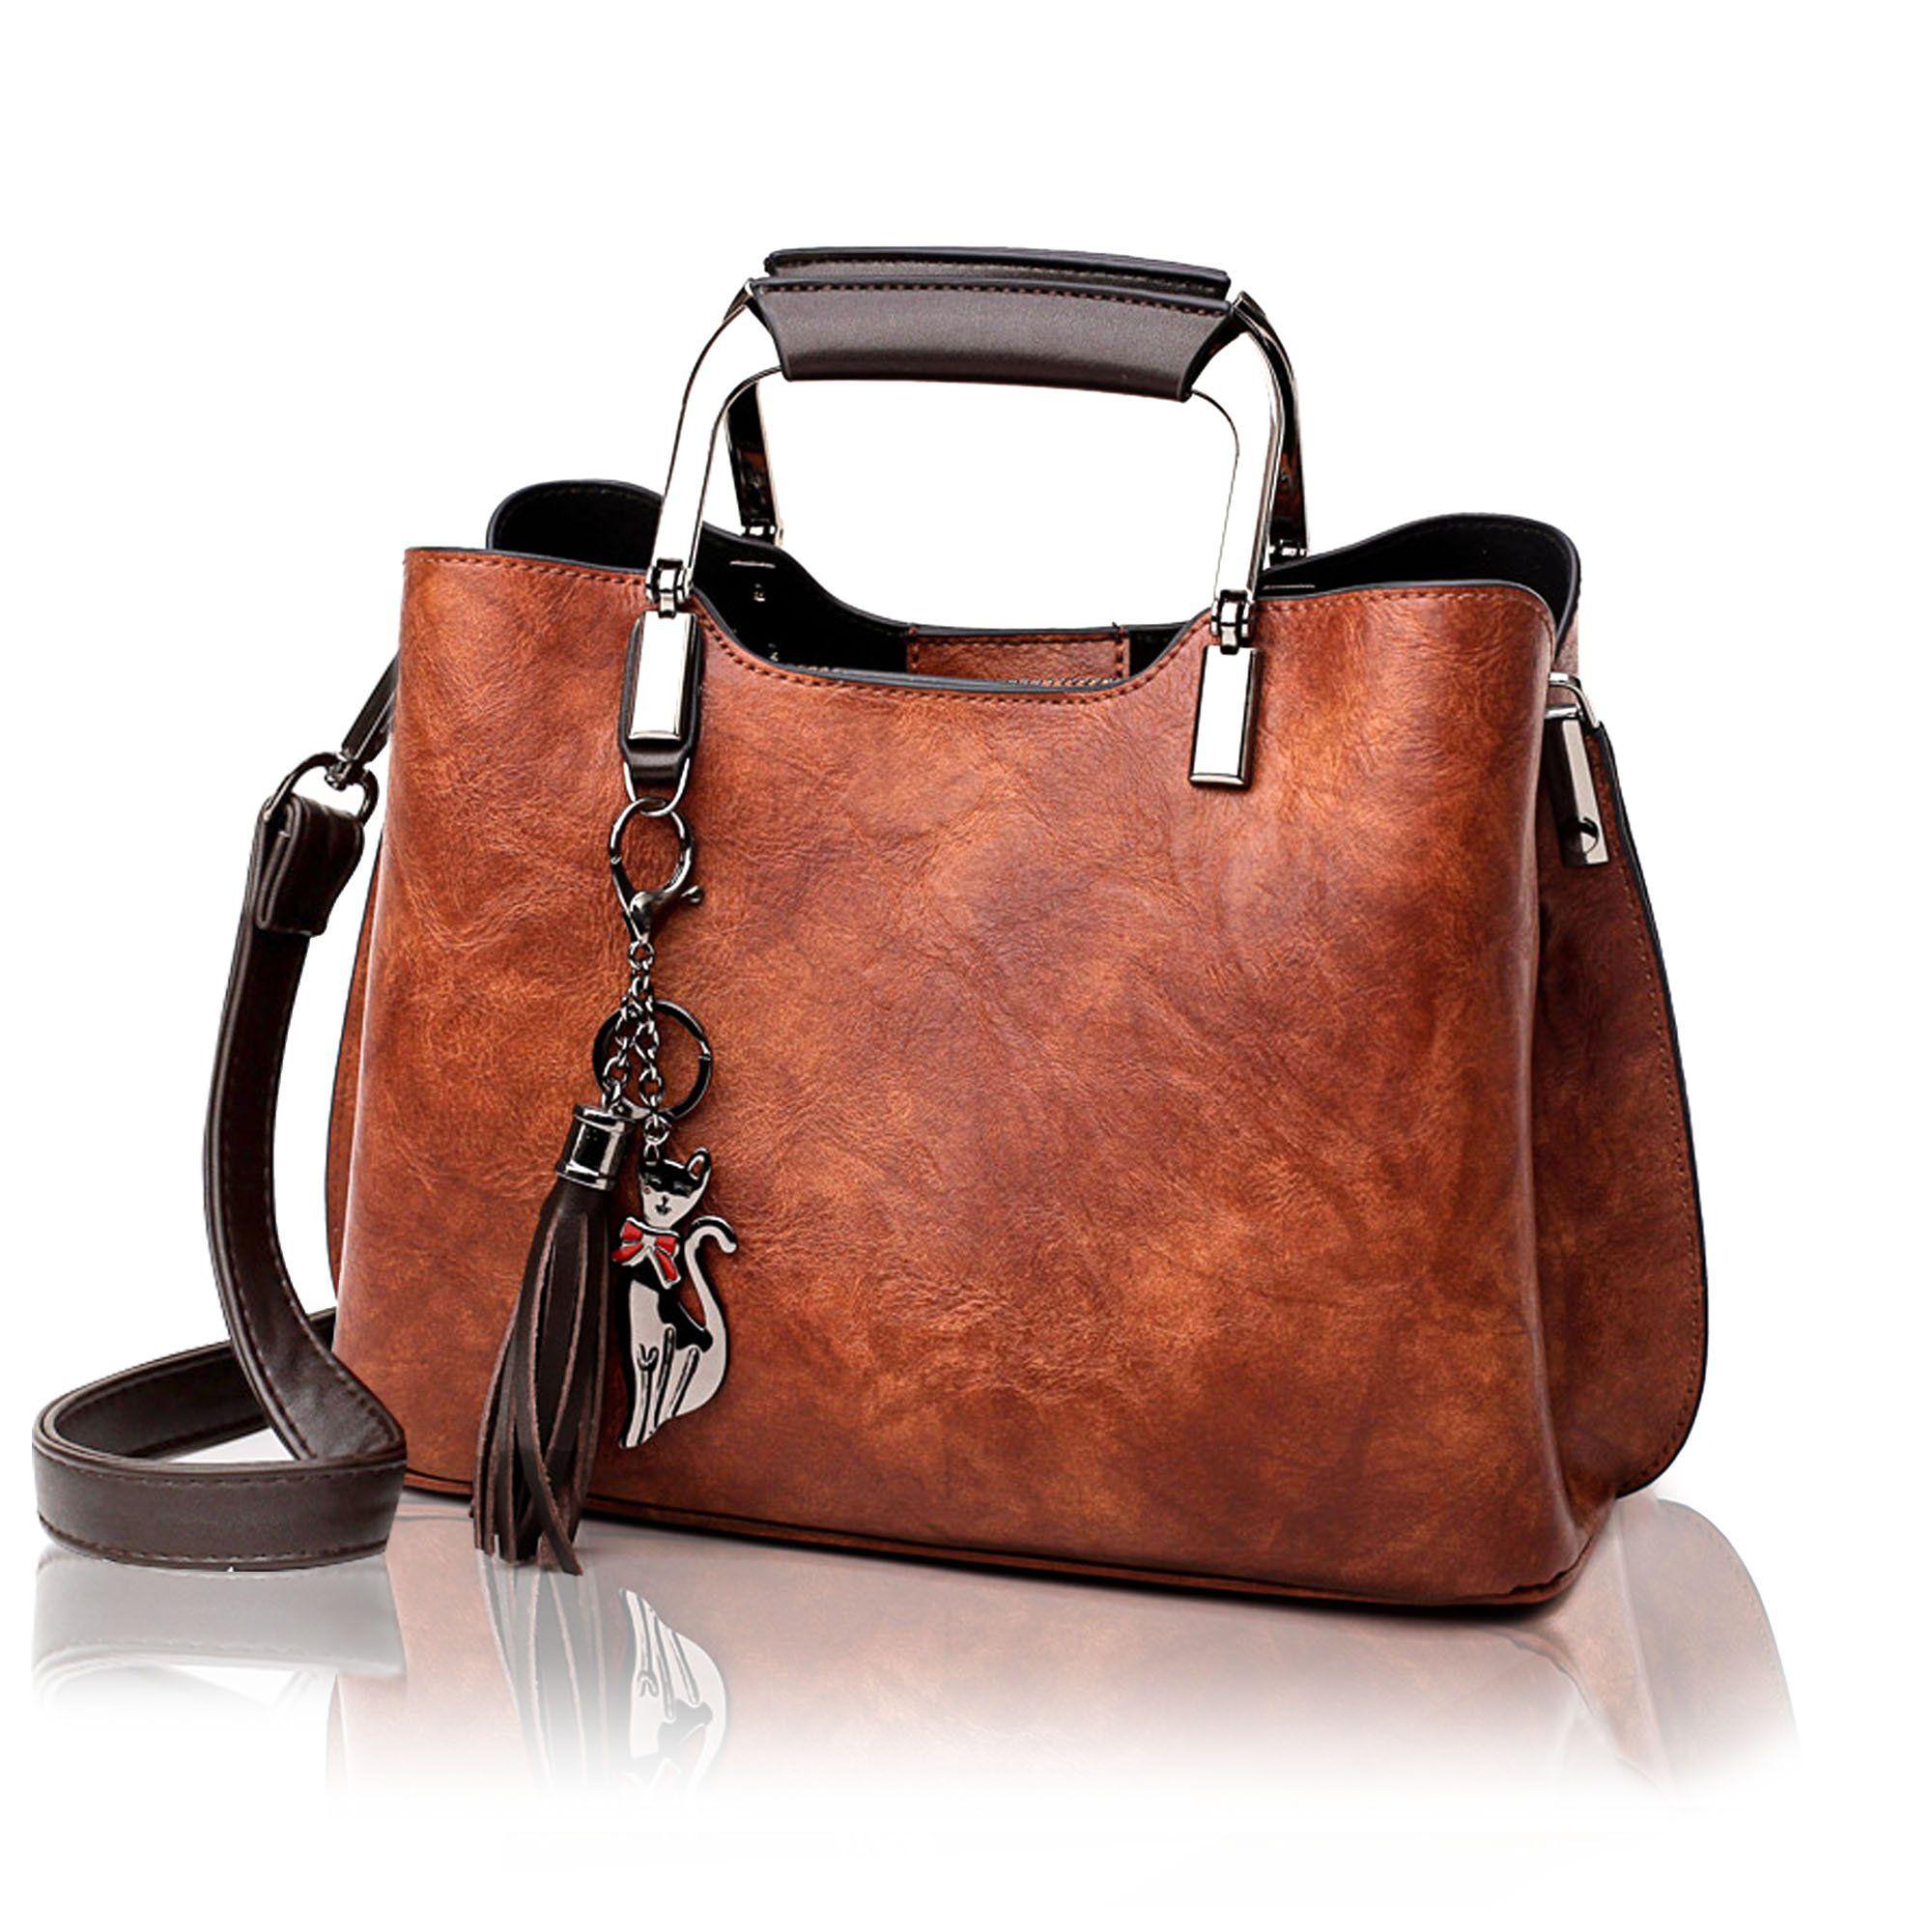 df88e7c17306 👜 78.88 🔜 rofozzi  Genuine Leather Handbag and Purse for Women - Ladies  Top-Handle and Crossbody Bag with Tassle  rofozzi  bag  shoppingday   shopnow ...